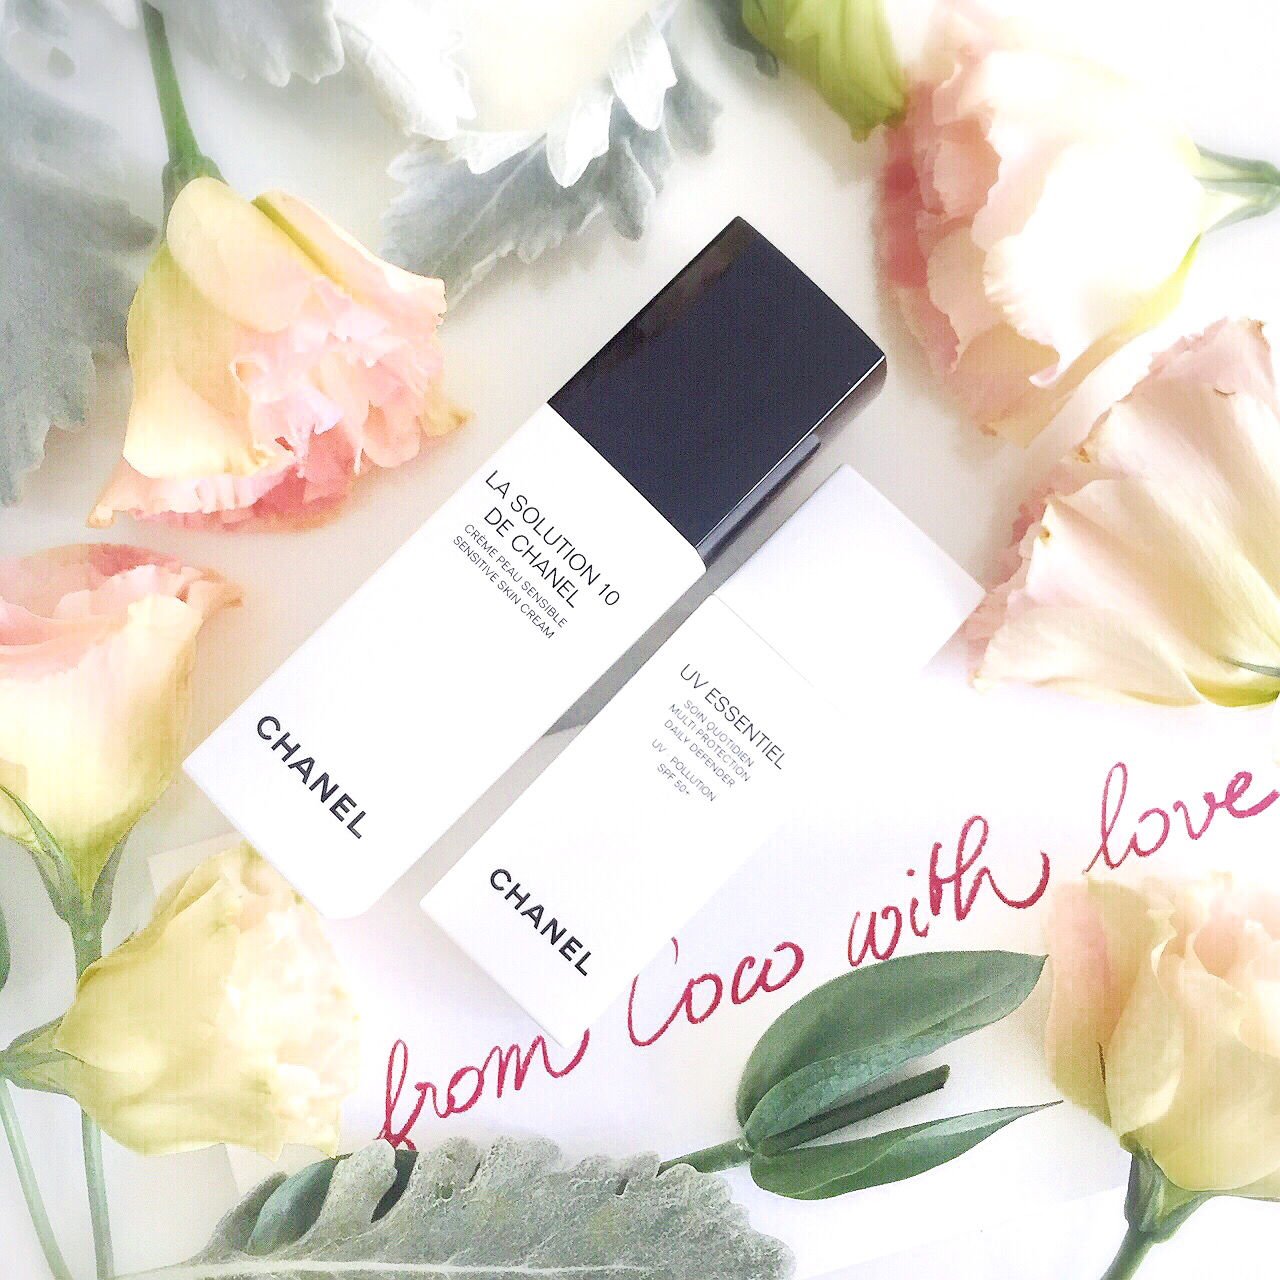 Chanel La Solution 10 UV Essentiel